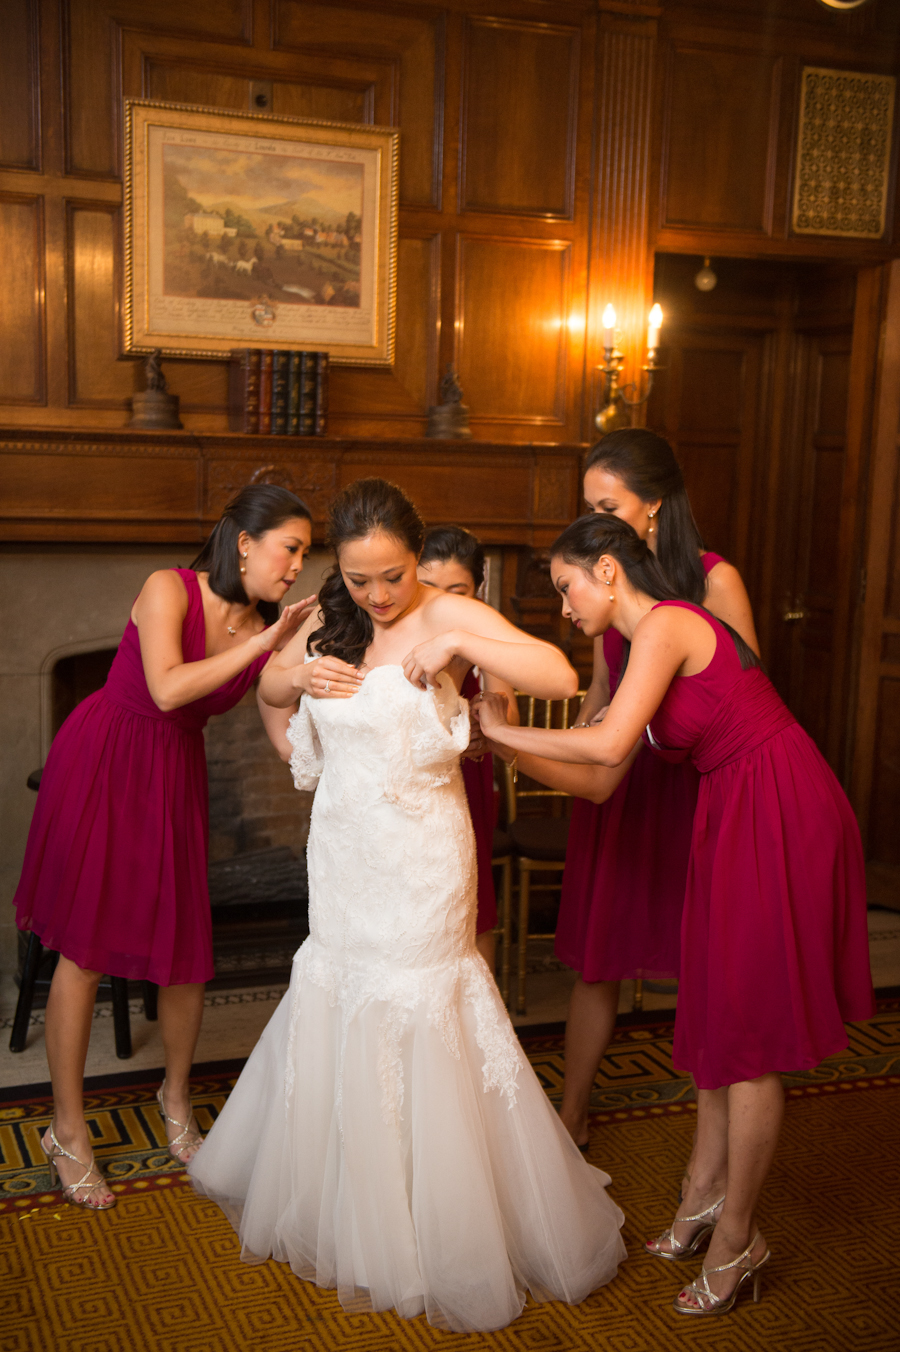 gotham hall brian hatton ang weddings and events-21.jpg